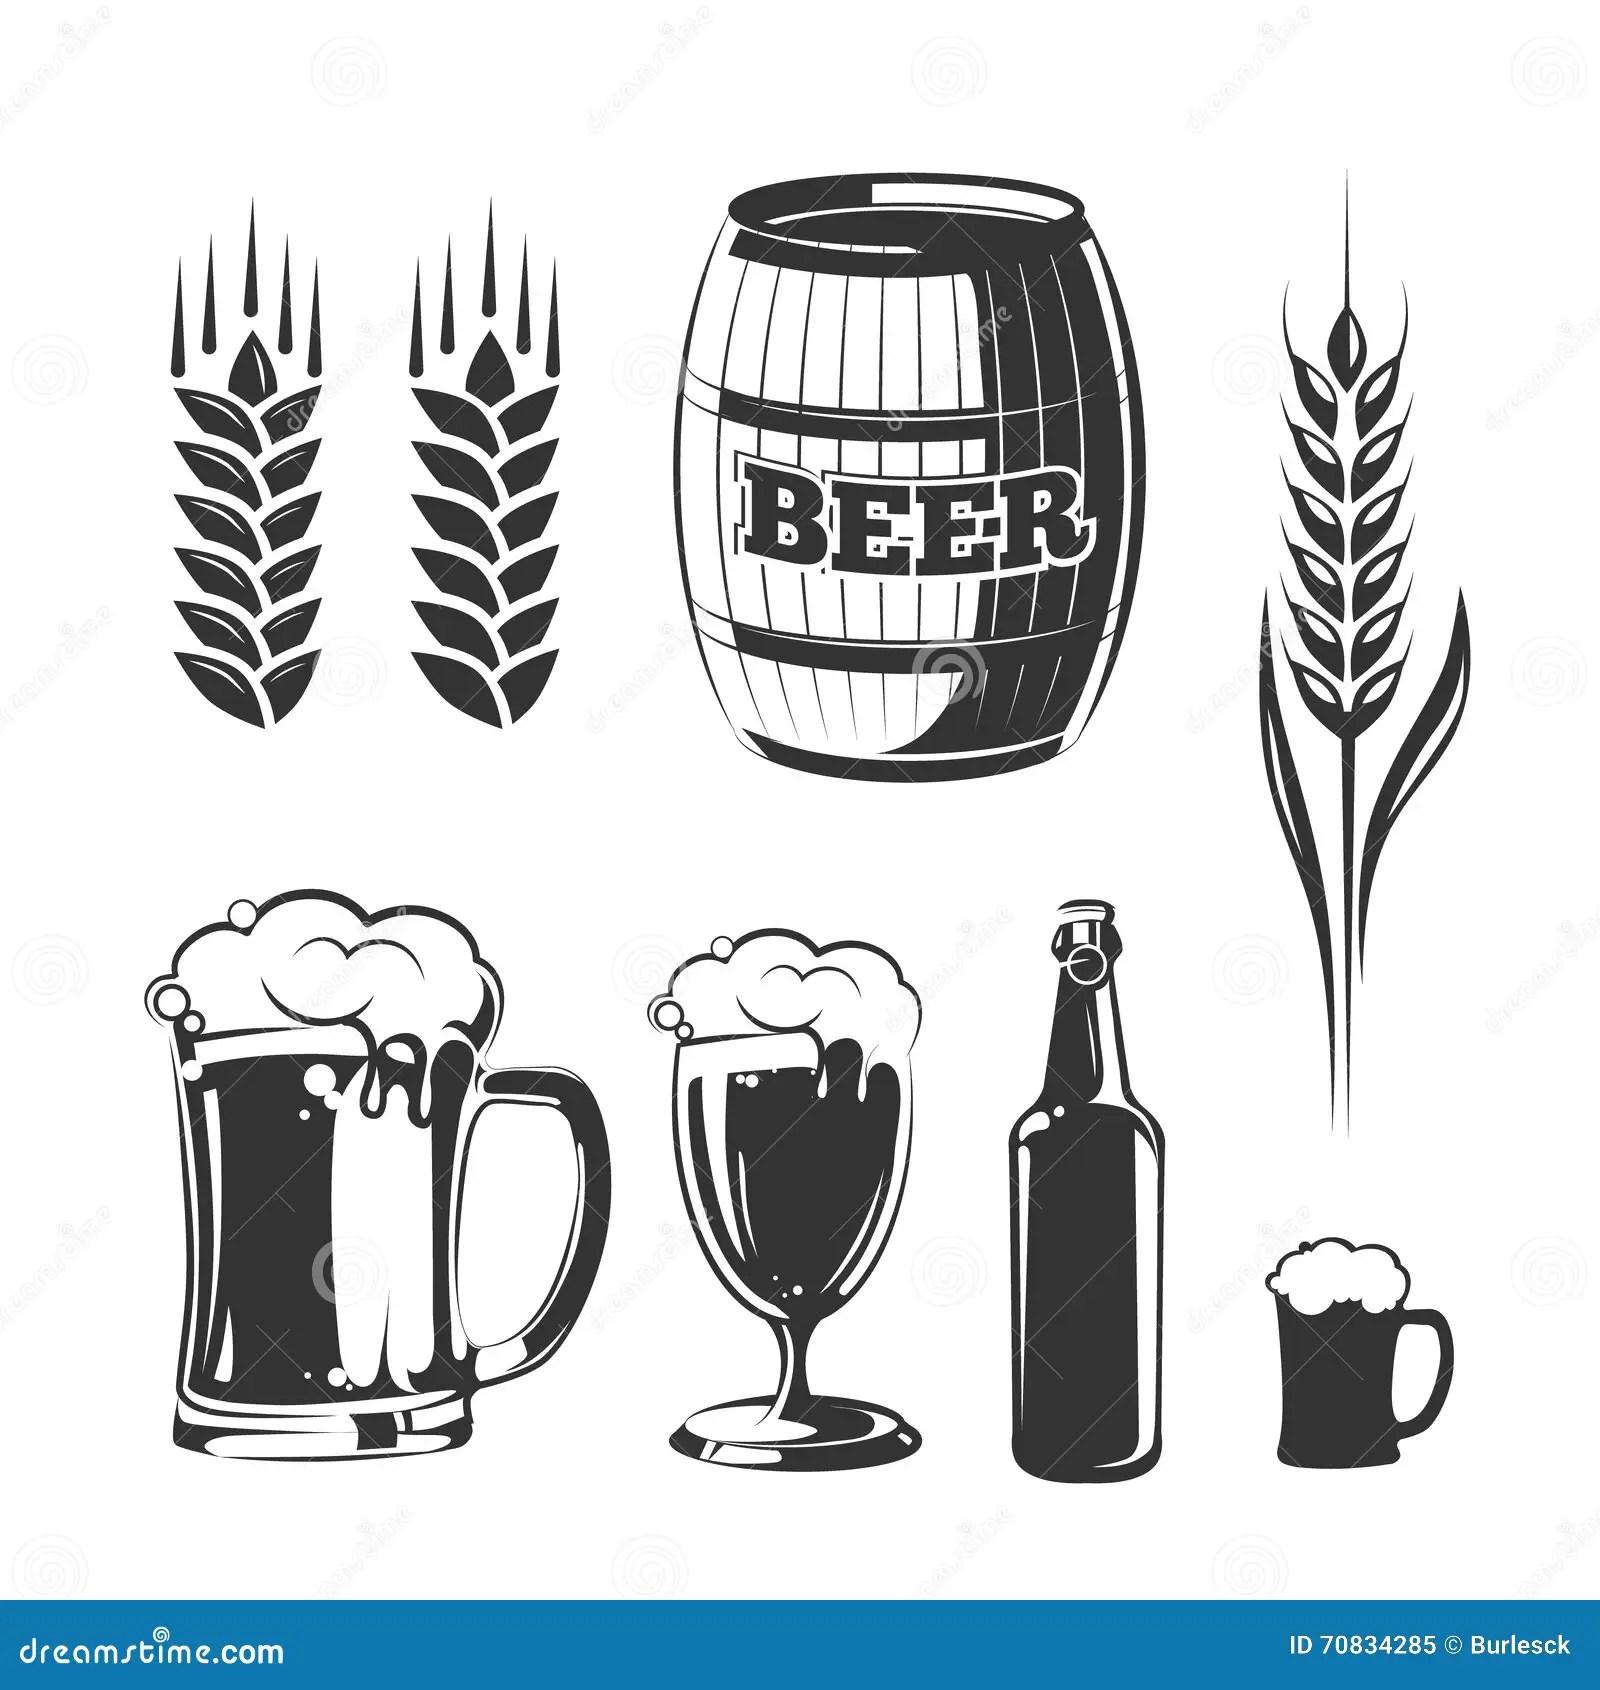 Beer Bottle And Glass Alcohol Drink Vintage Vector